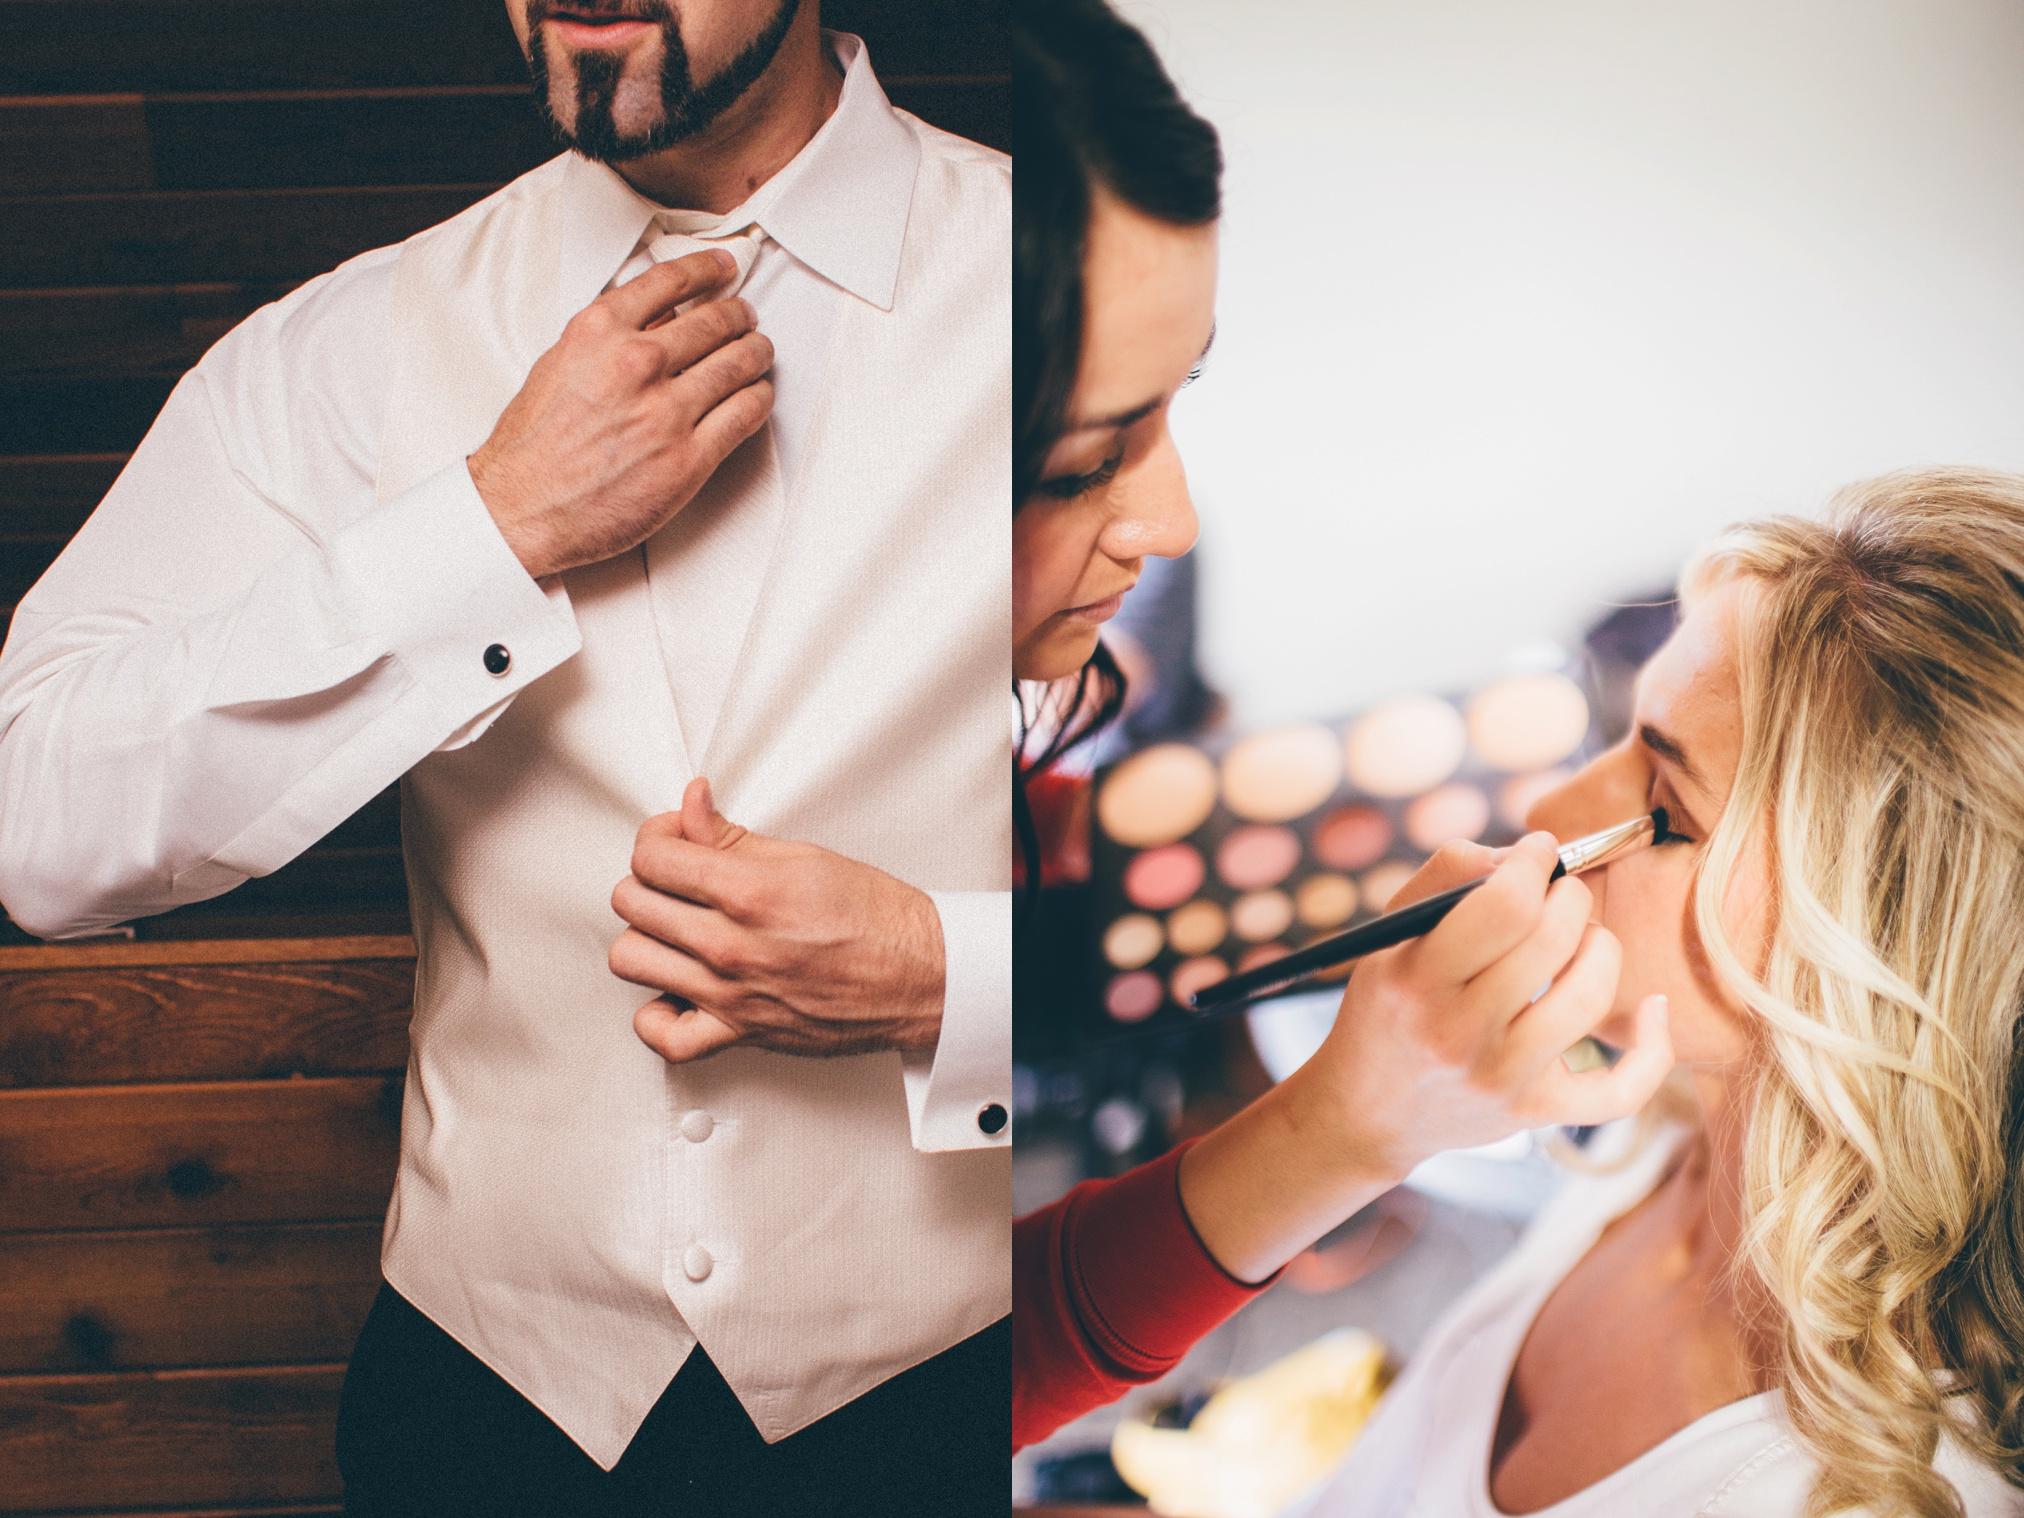 schmid_wedding-18.jpg